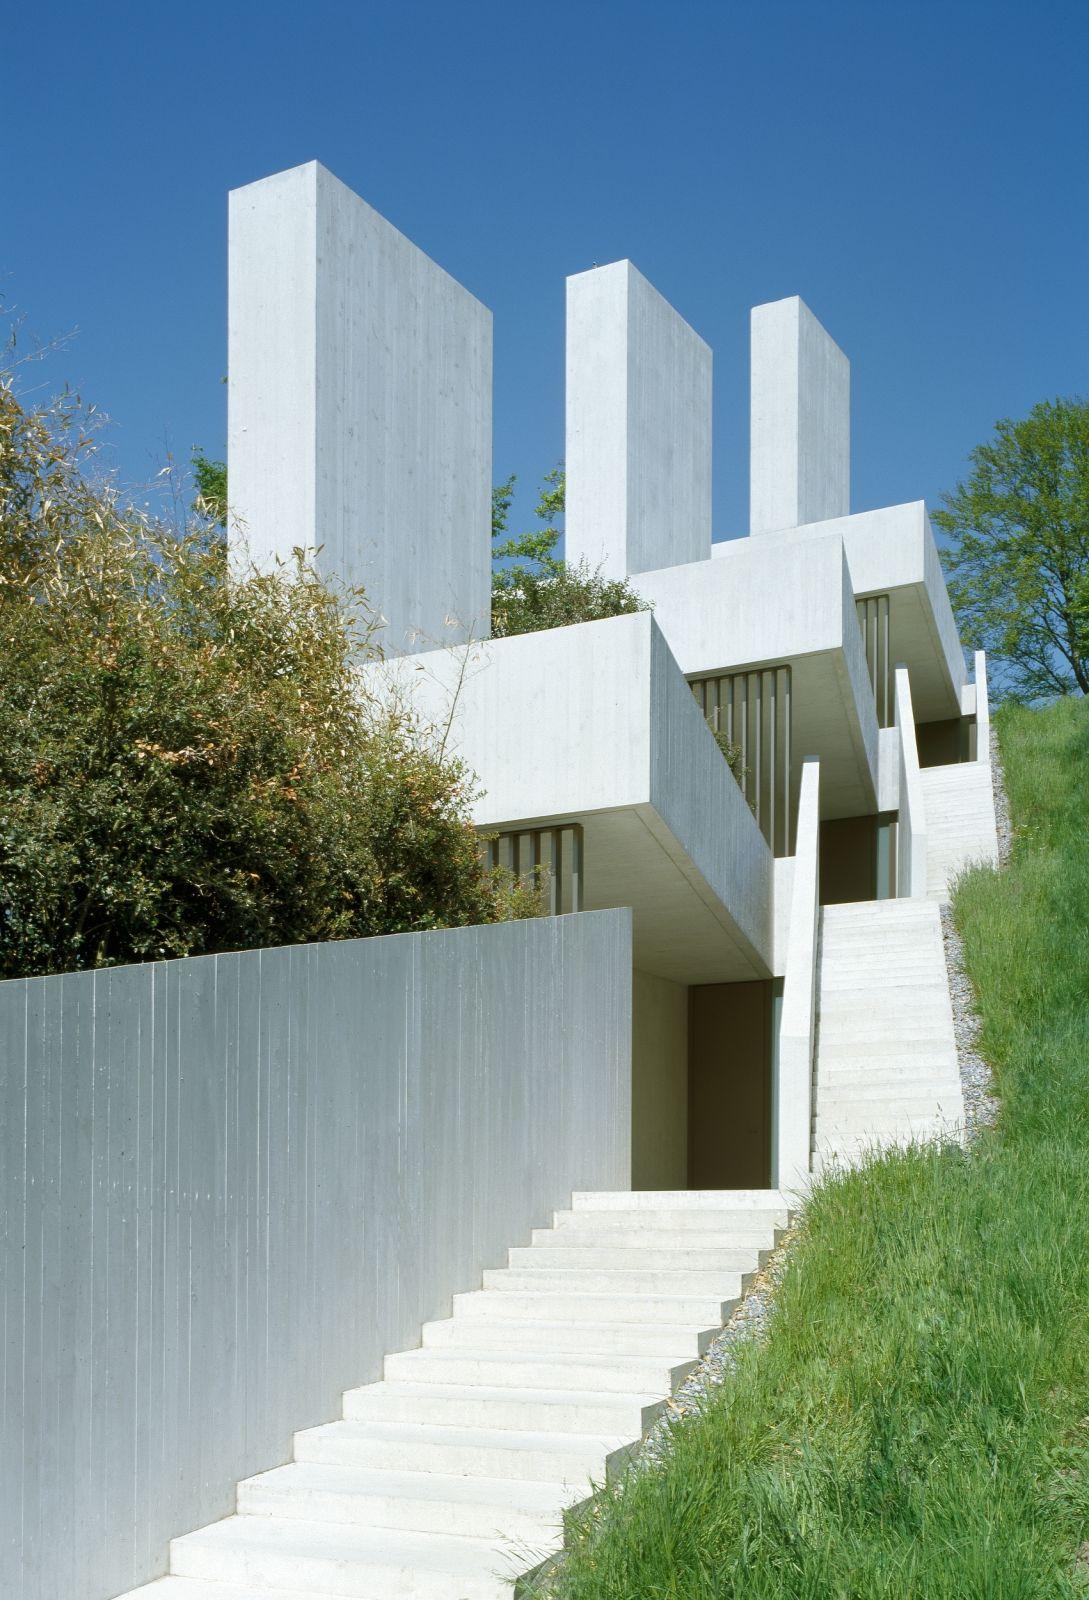 Drei Terrassenhäuser in Luzern by Daniele Marques. | Villas ...